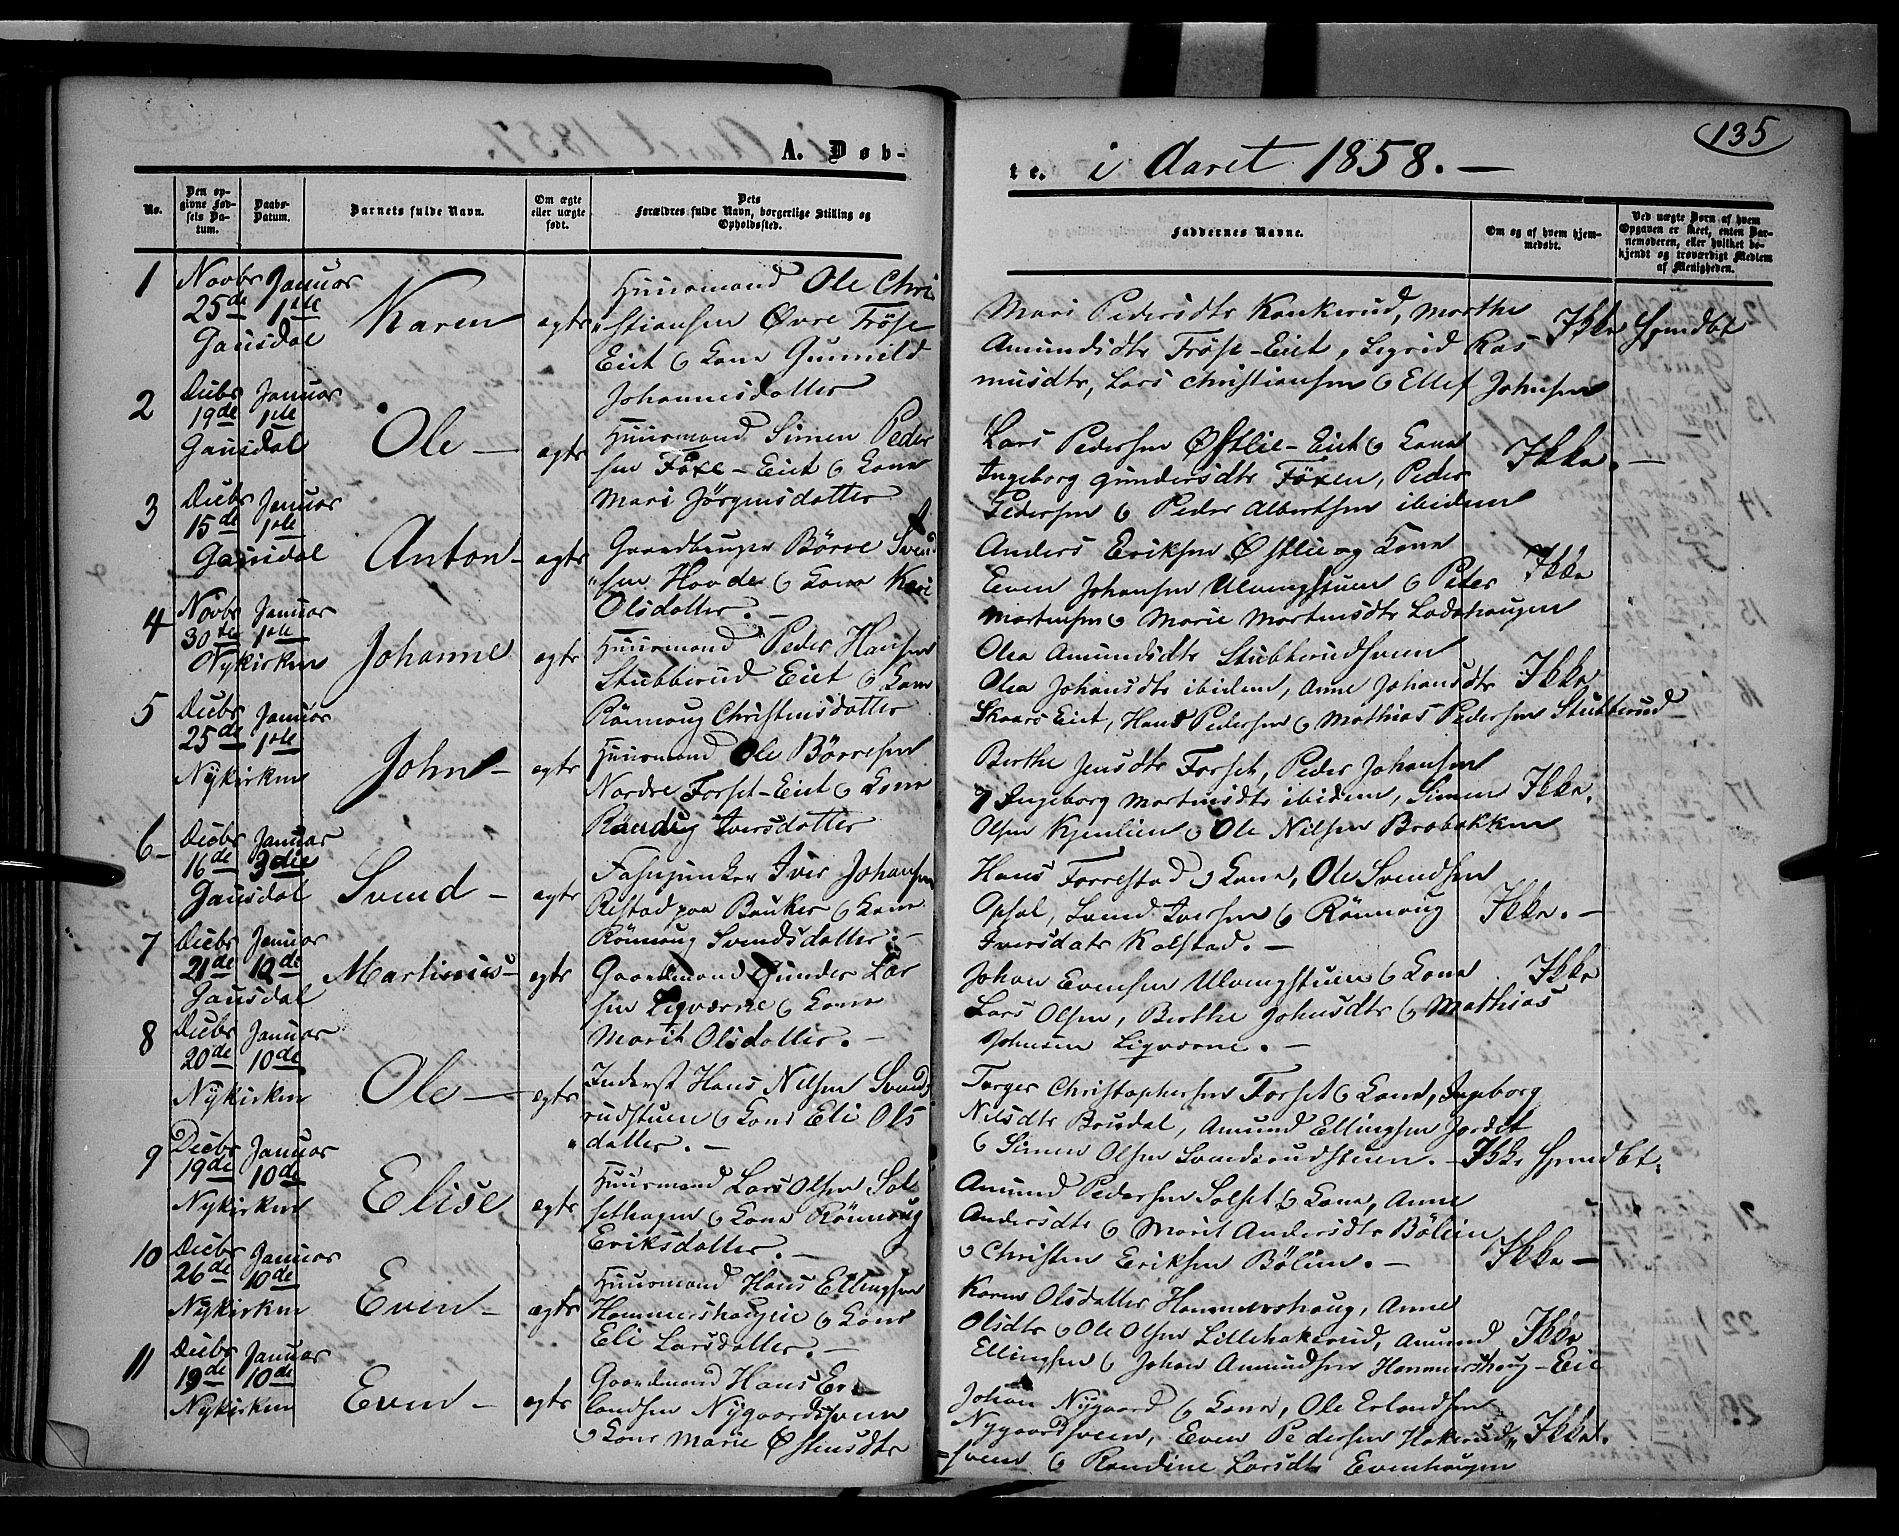 SAH, Gausdal prestekontor, Ministerialbok nr. 8, 1850-1861, s. 135